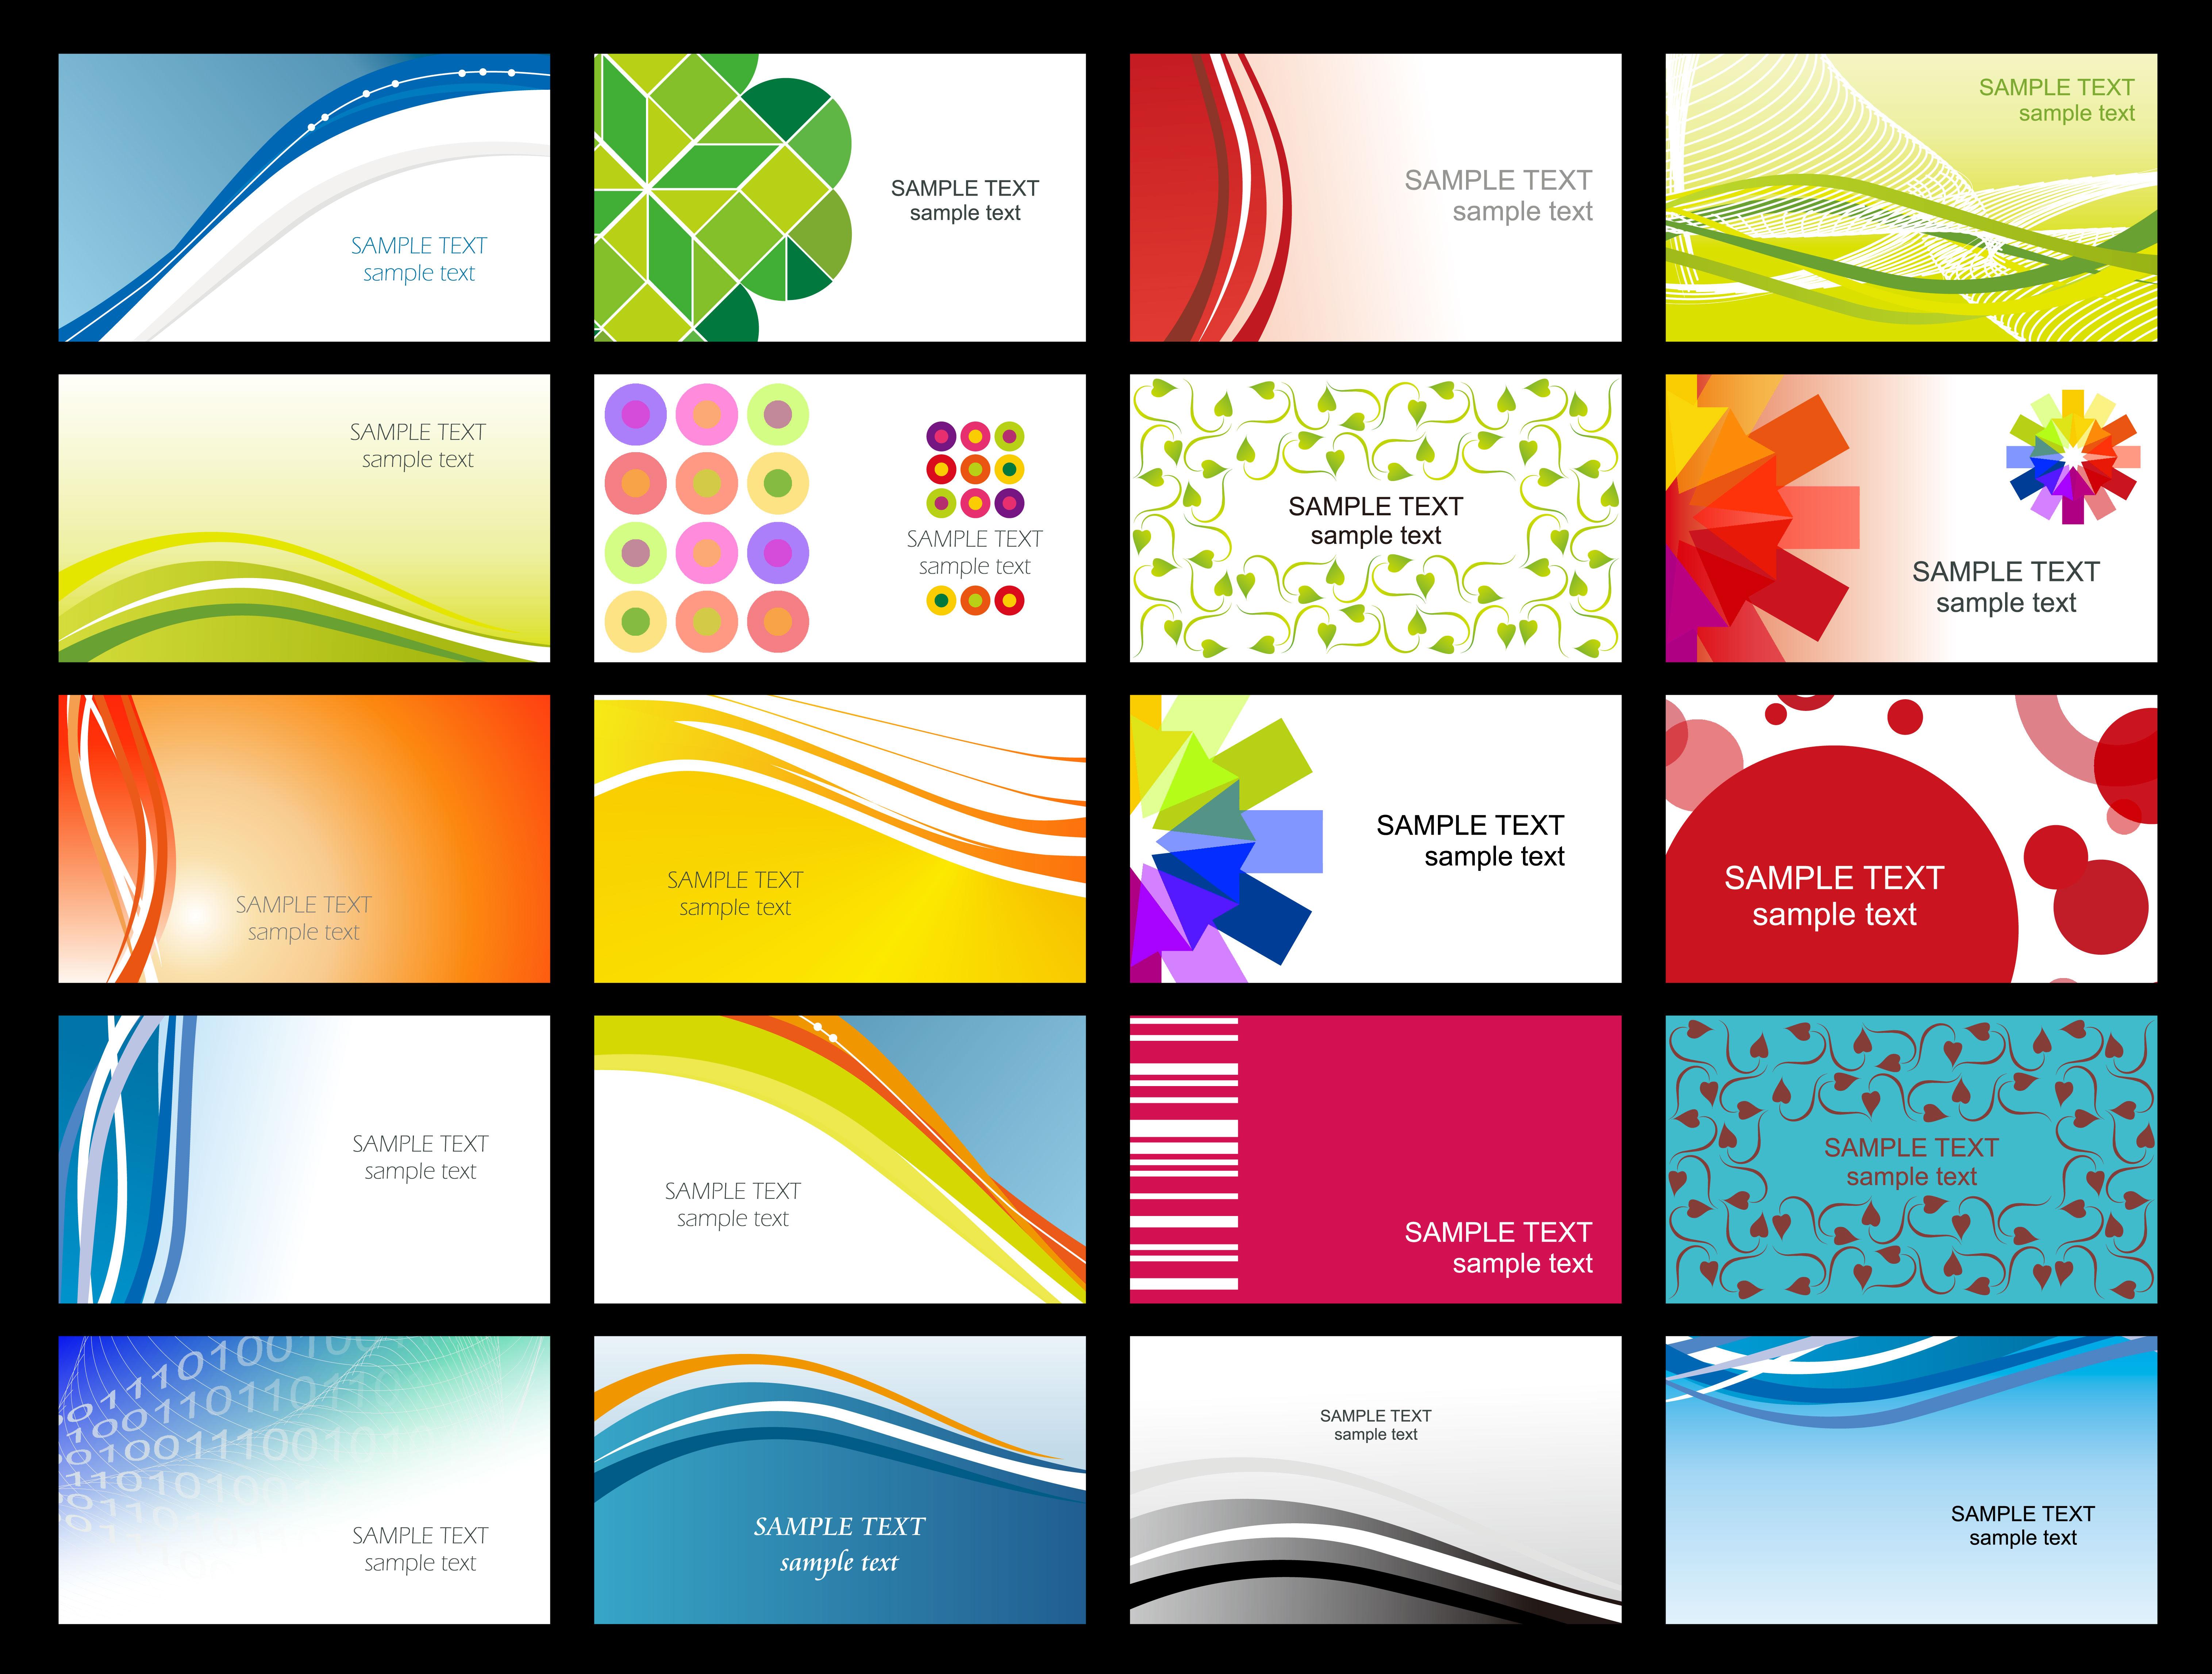 Free Printable Business Card Templates Sample | Get Sniffer - Free Printable Blank Business Cards